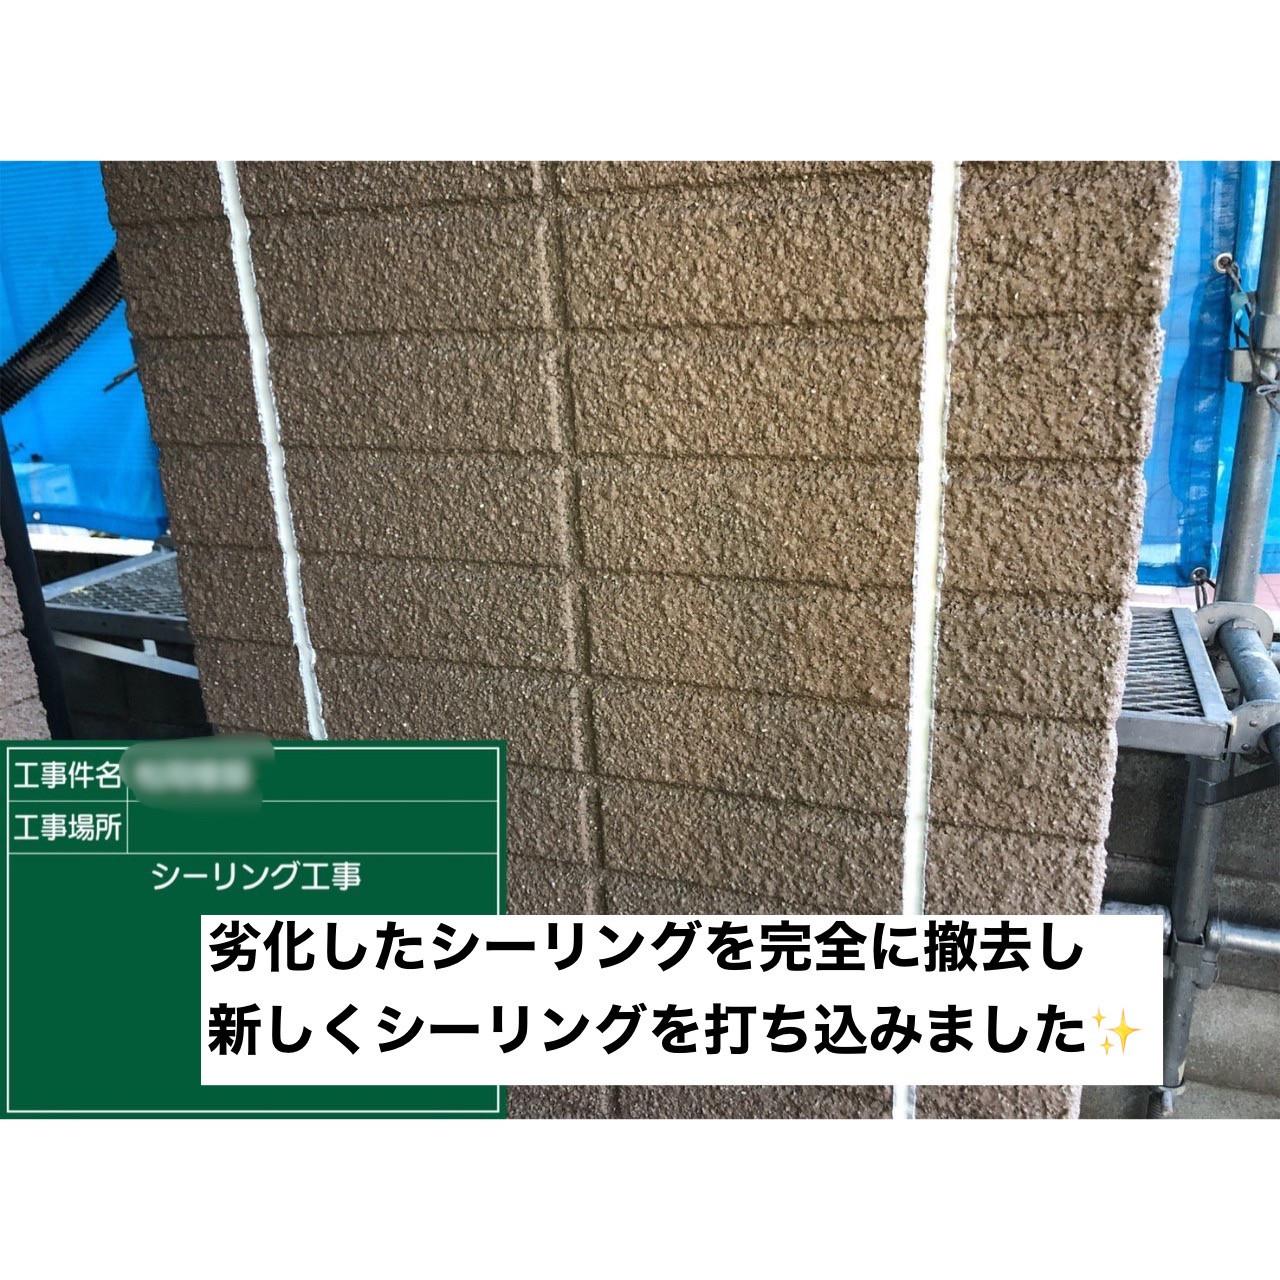 外壁・屋根塗装 ラジカル制御型塗料